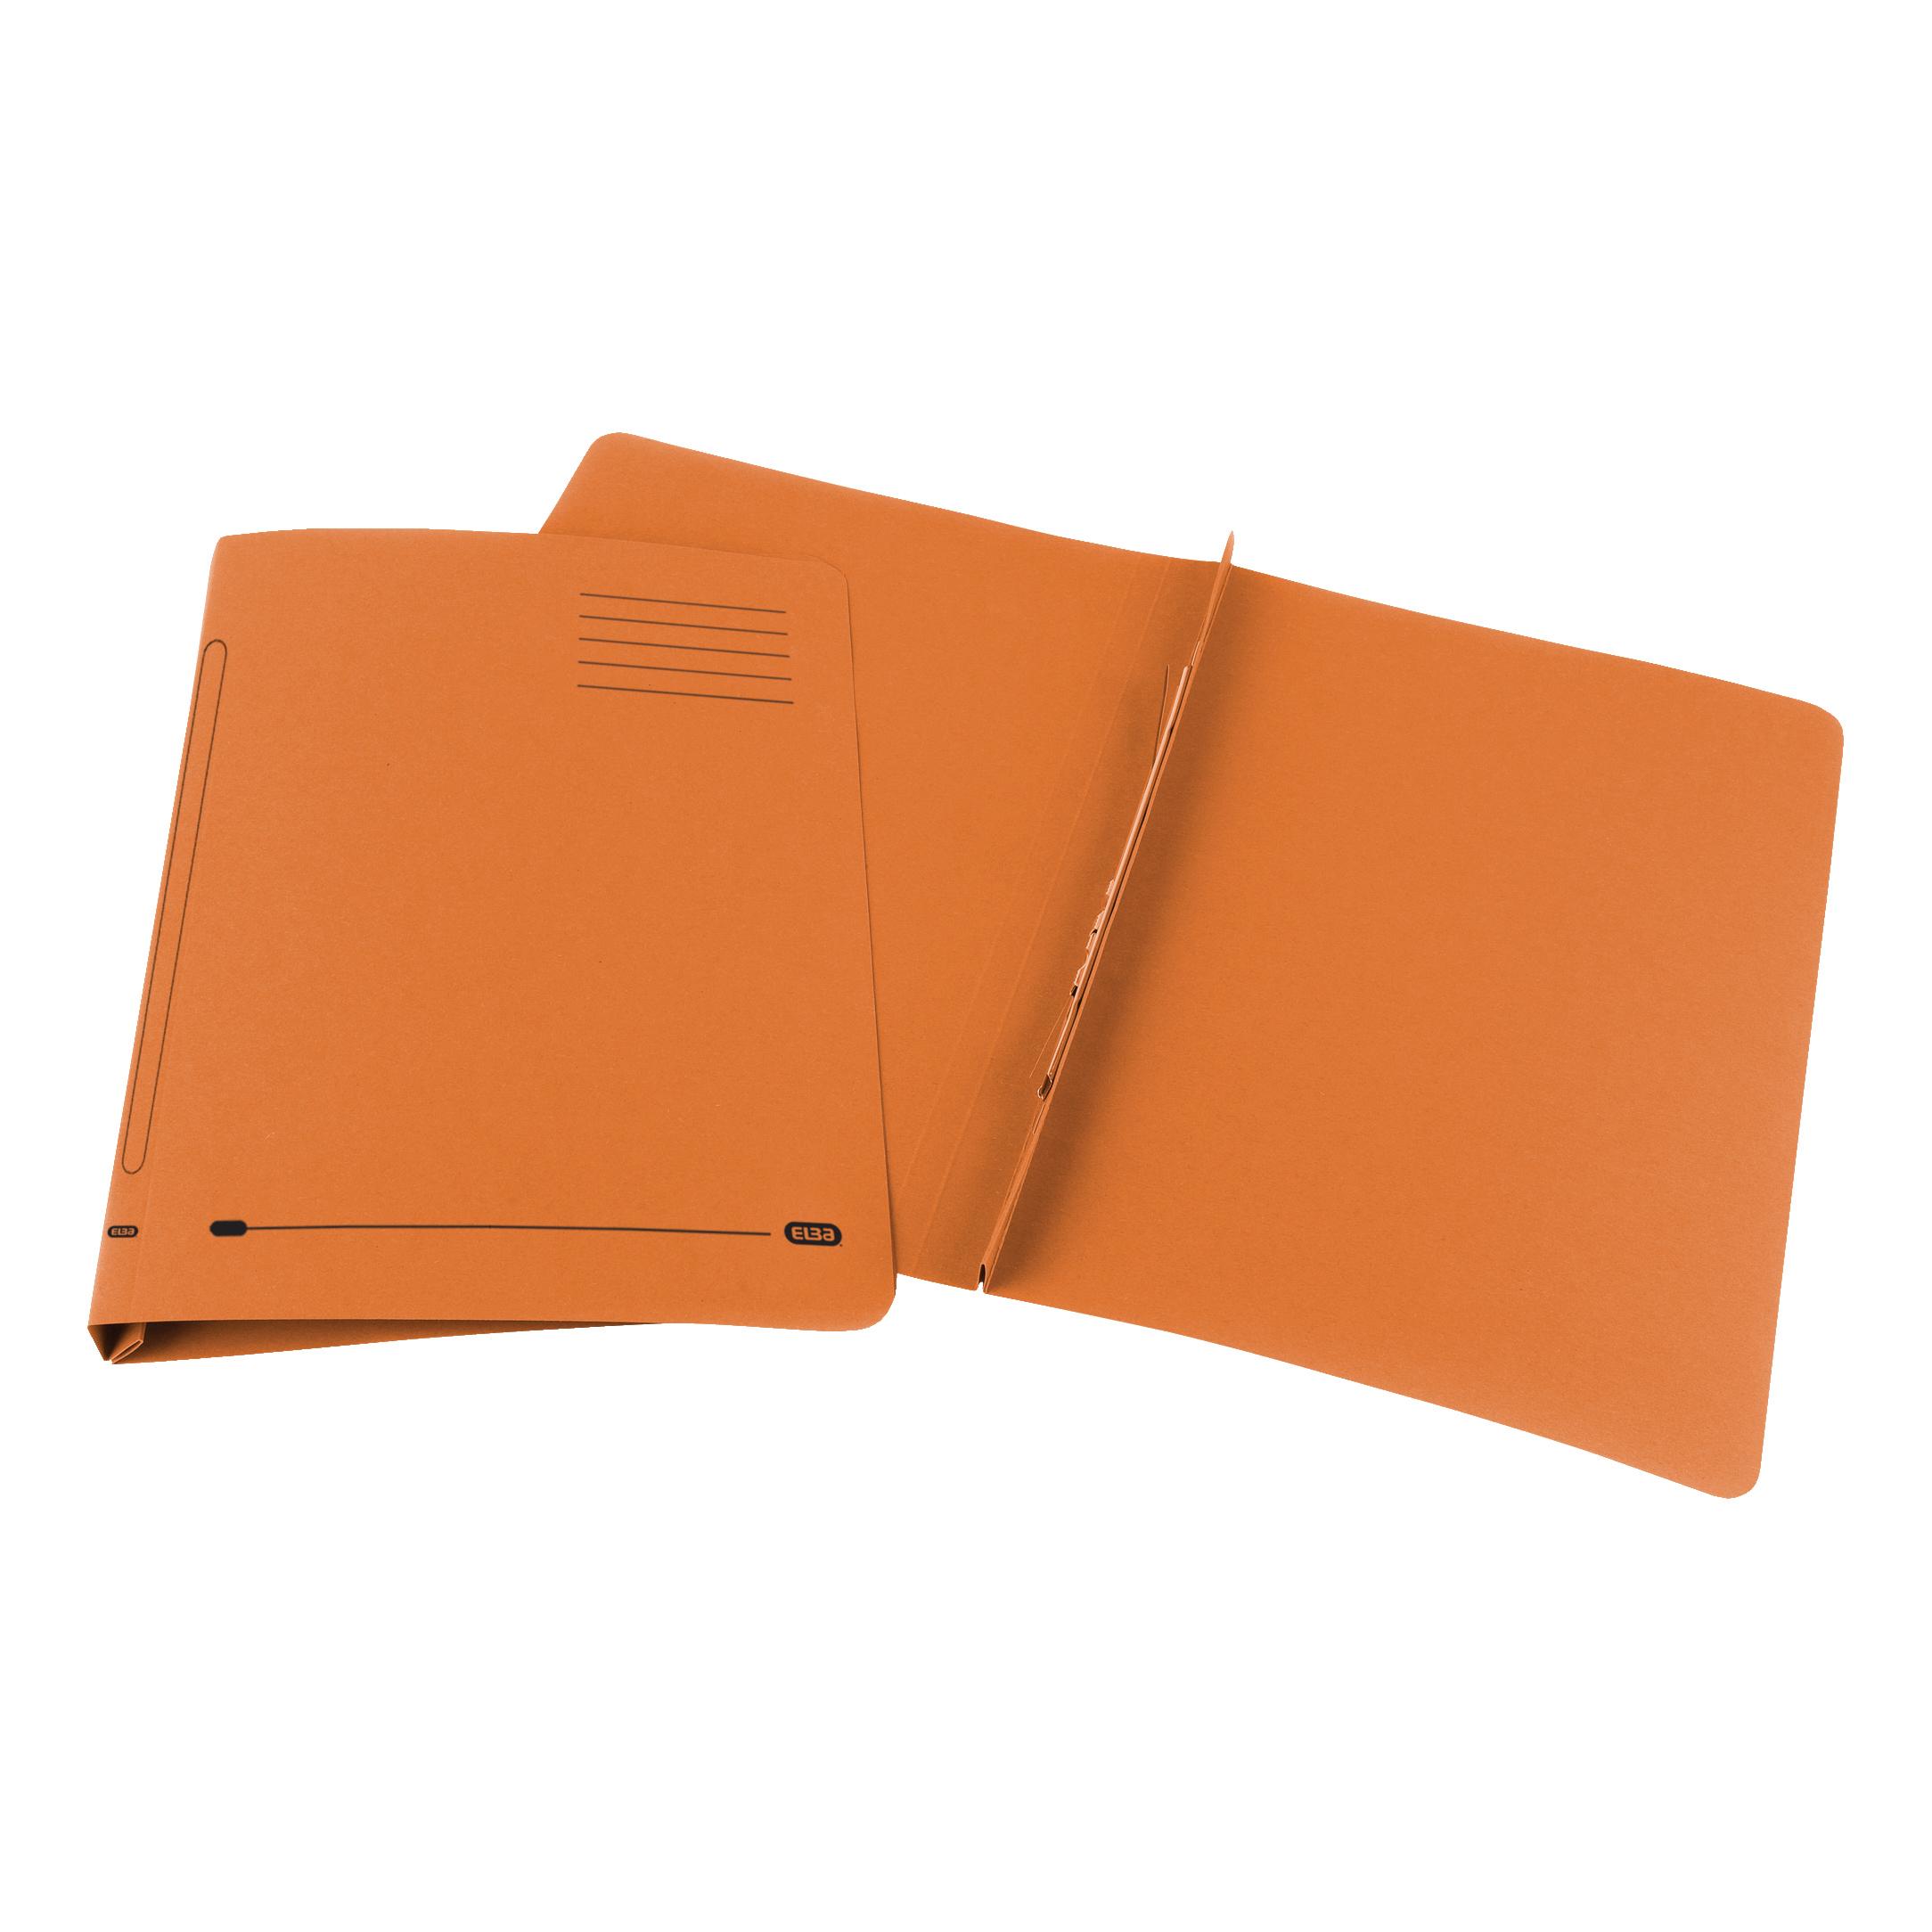 Elba Ashley Flat Bar File (no pocket) 285gsm Capacity 35mm Foolscap Orange Ref 100090283 Pack 25